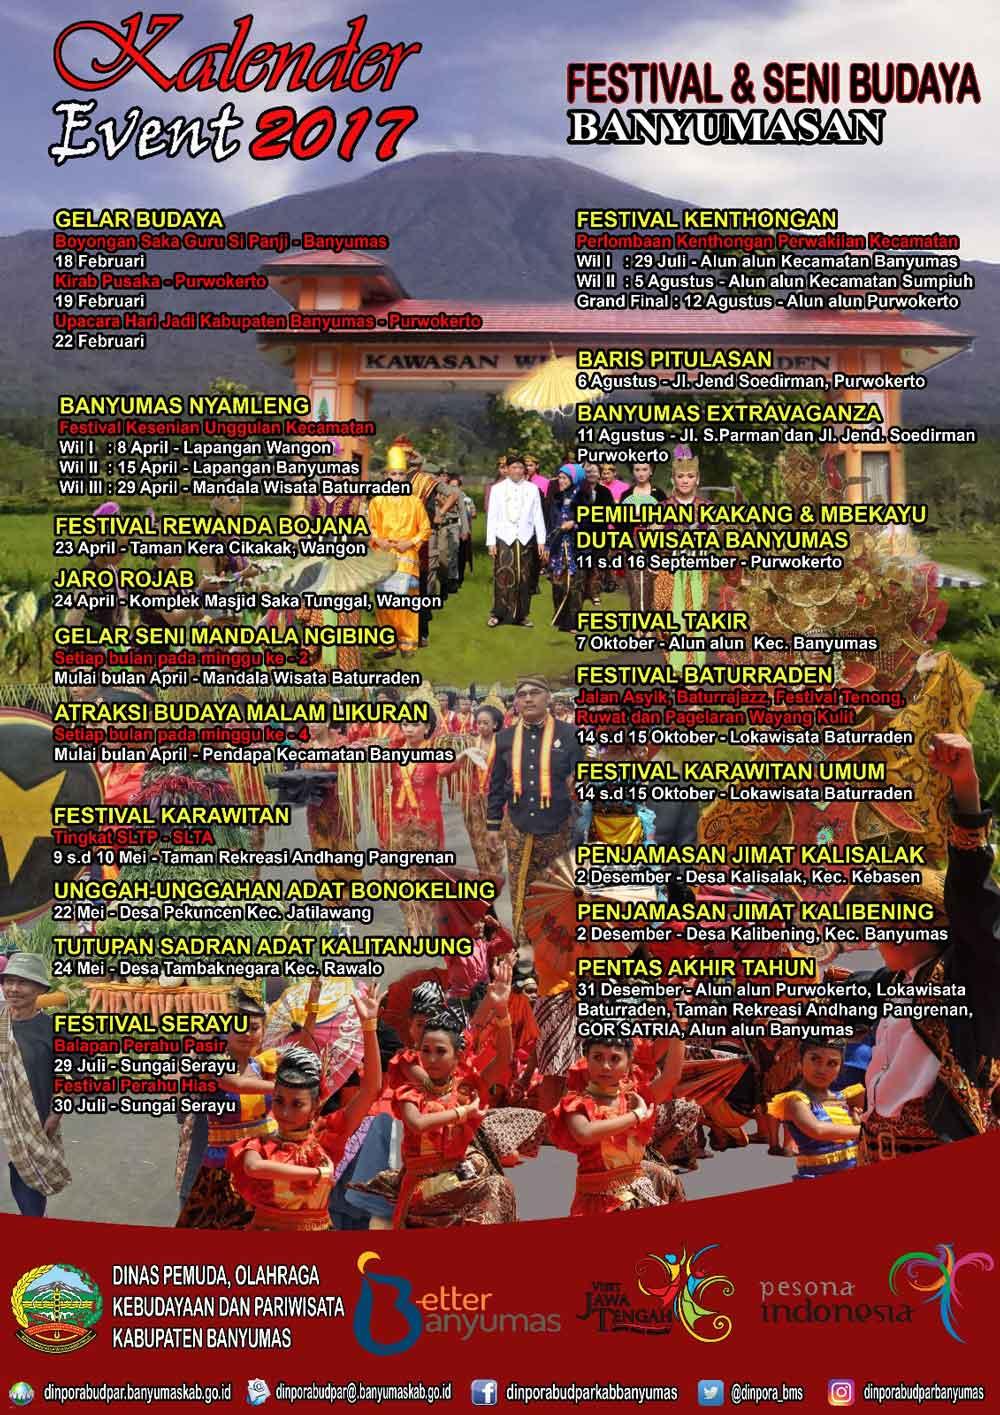 Kalender Event Banyumas 2017 Purwokerto Guidance Mandala Wisata Baturraden Kab